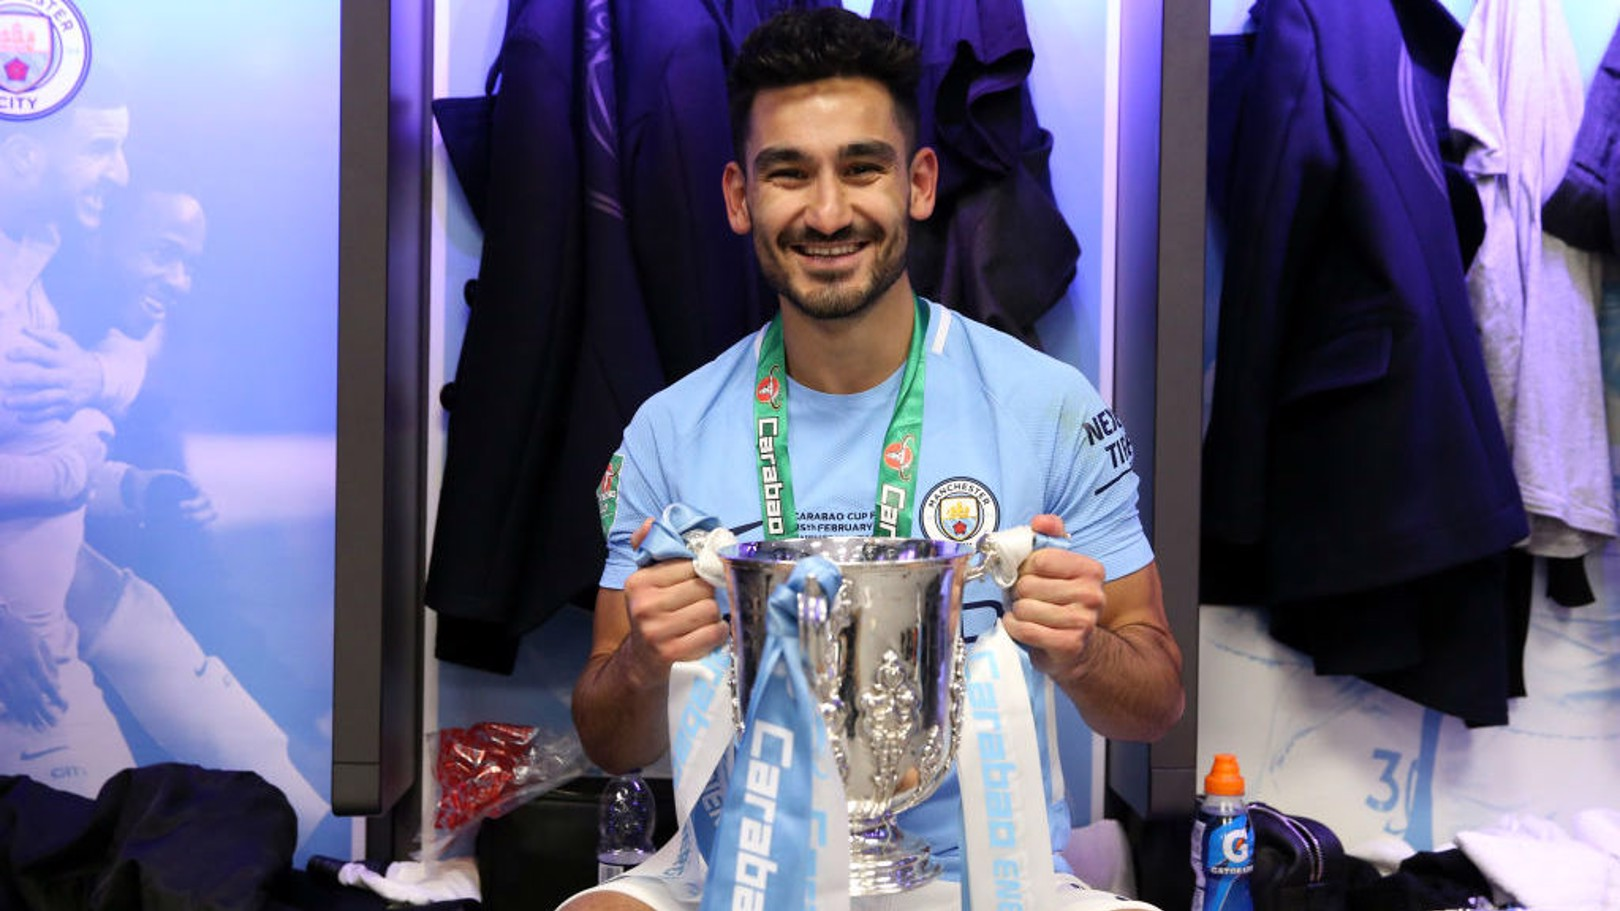 SILVER SERVICE: Ilkay Gundogan celebrates the Carabao Cup win.